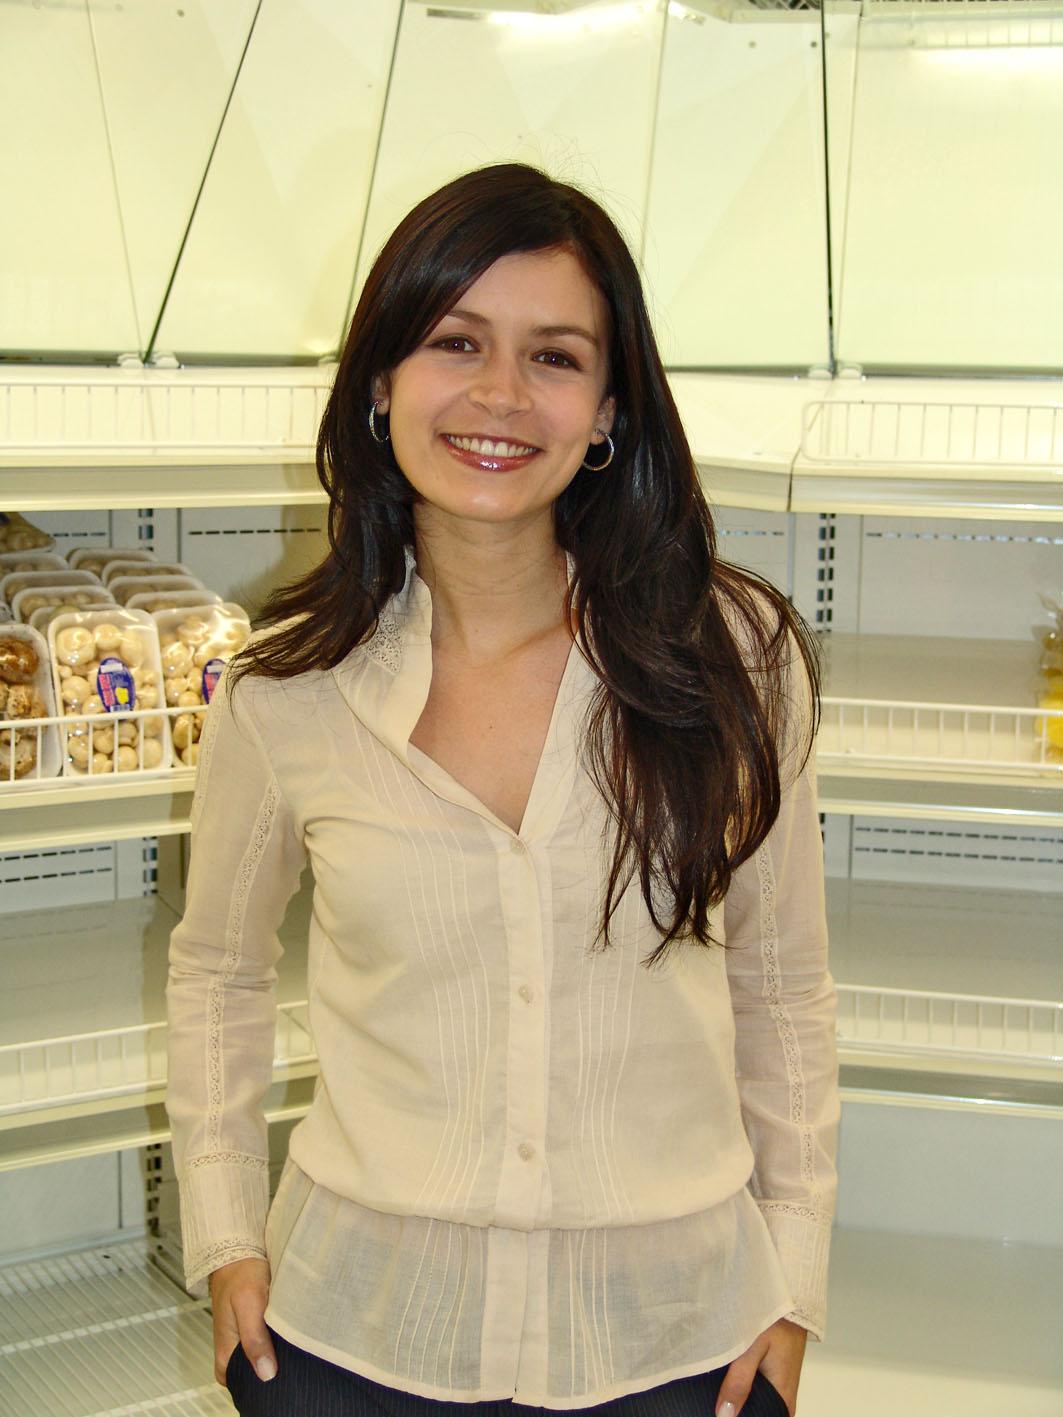 Bianca Castanho Net Worth